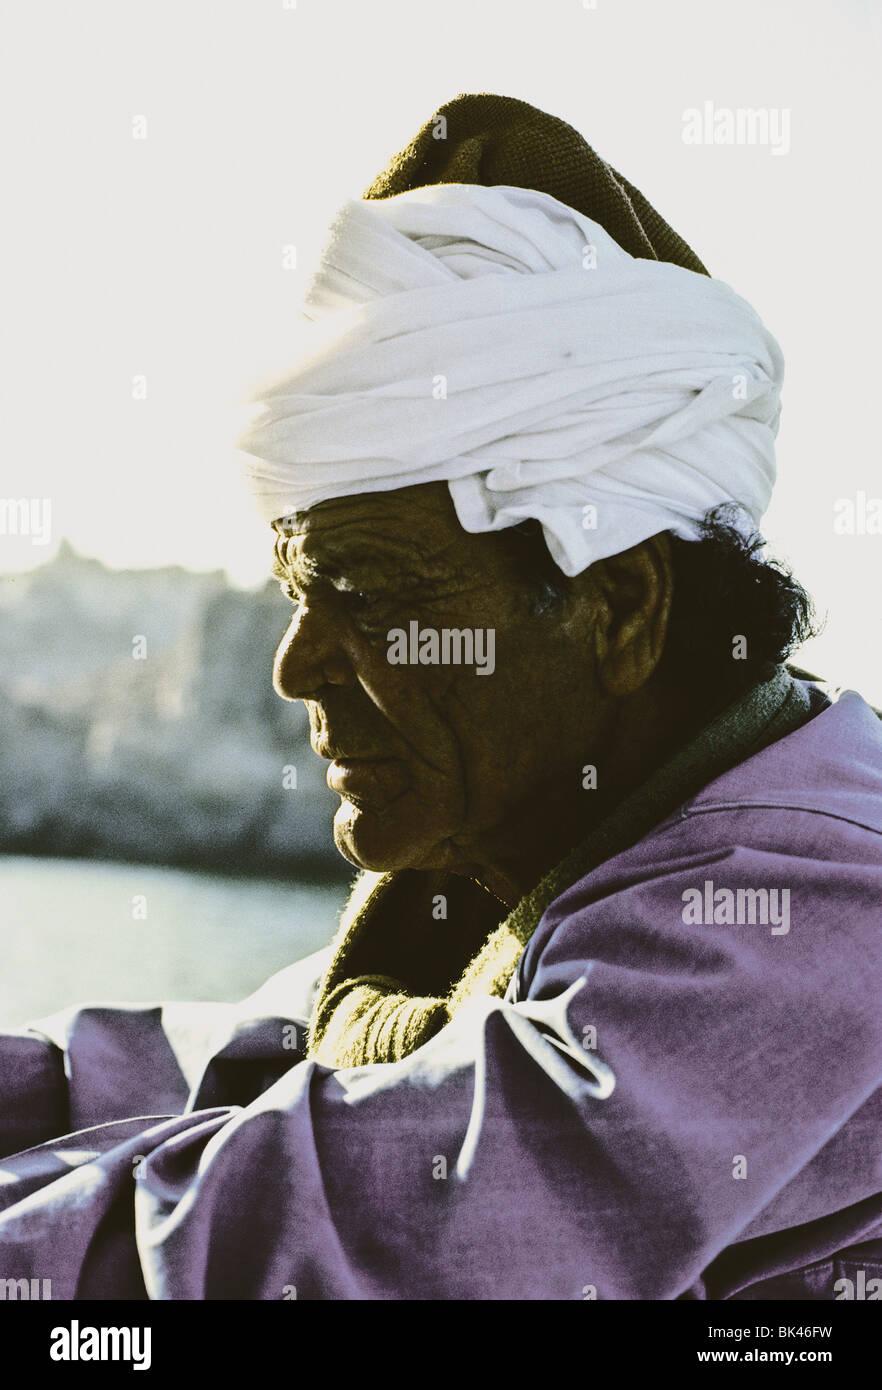 Profile of a man wearing a white turban, Egypt - Stock Image